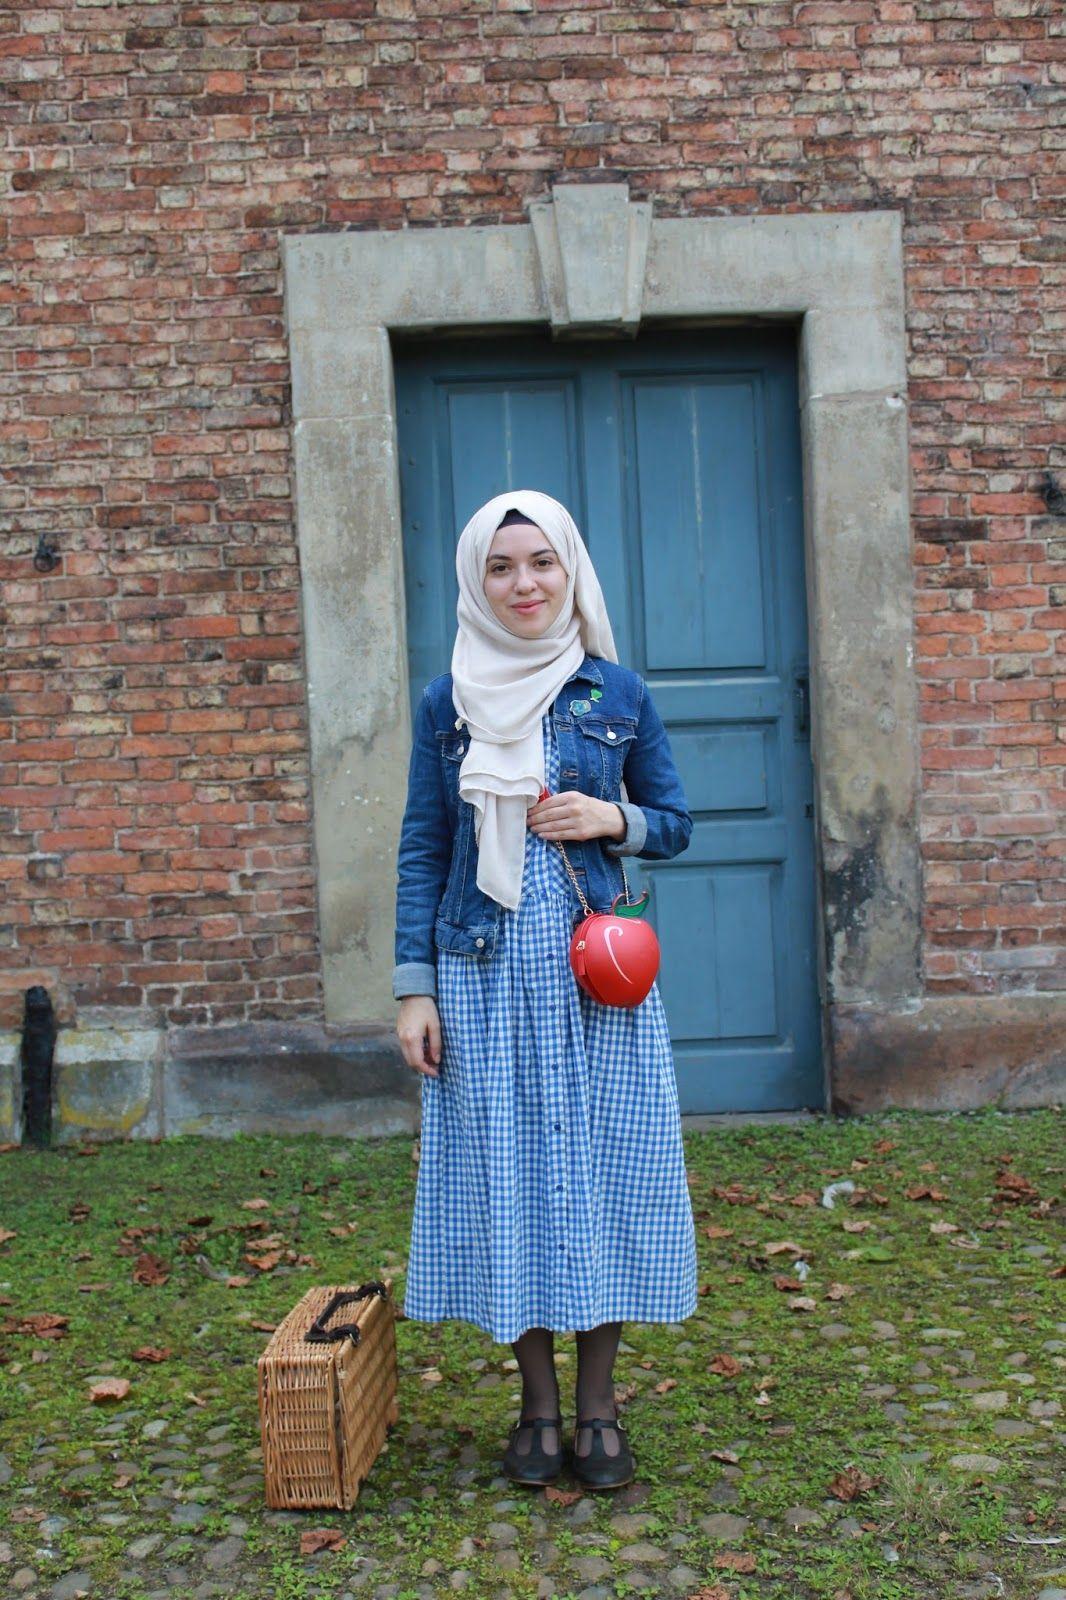 Vintagonista Vintage Blue Gingham Dress Vintage Style Country Style Wicker Basket Vintage Hijab Styl Vintage Outfits Vintage Fashion Fashion Clothes Women